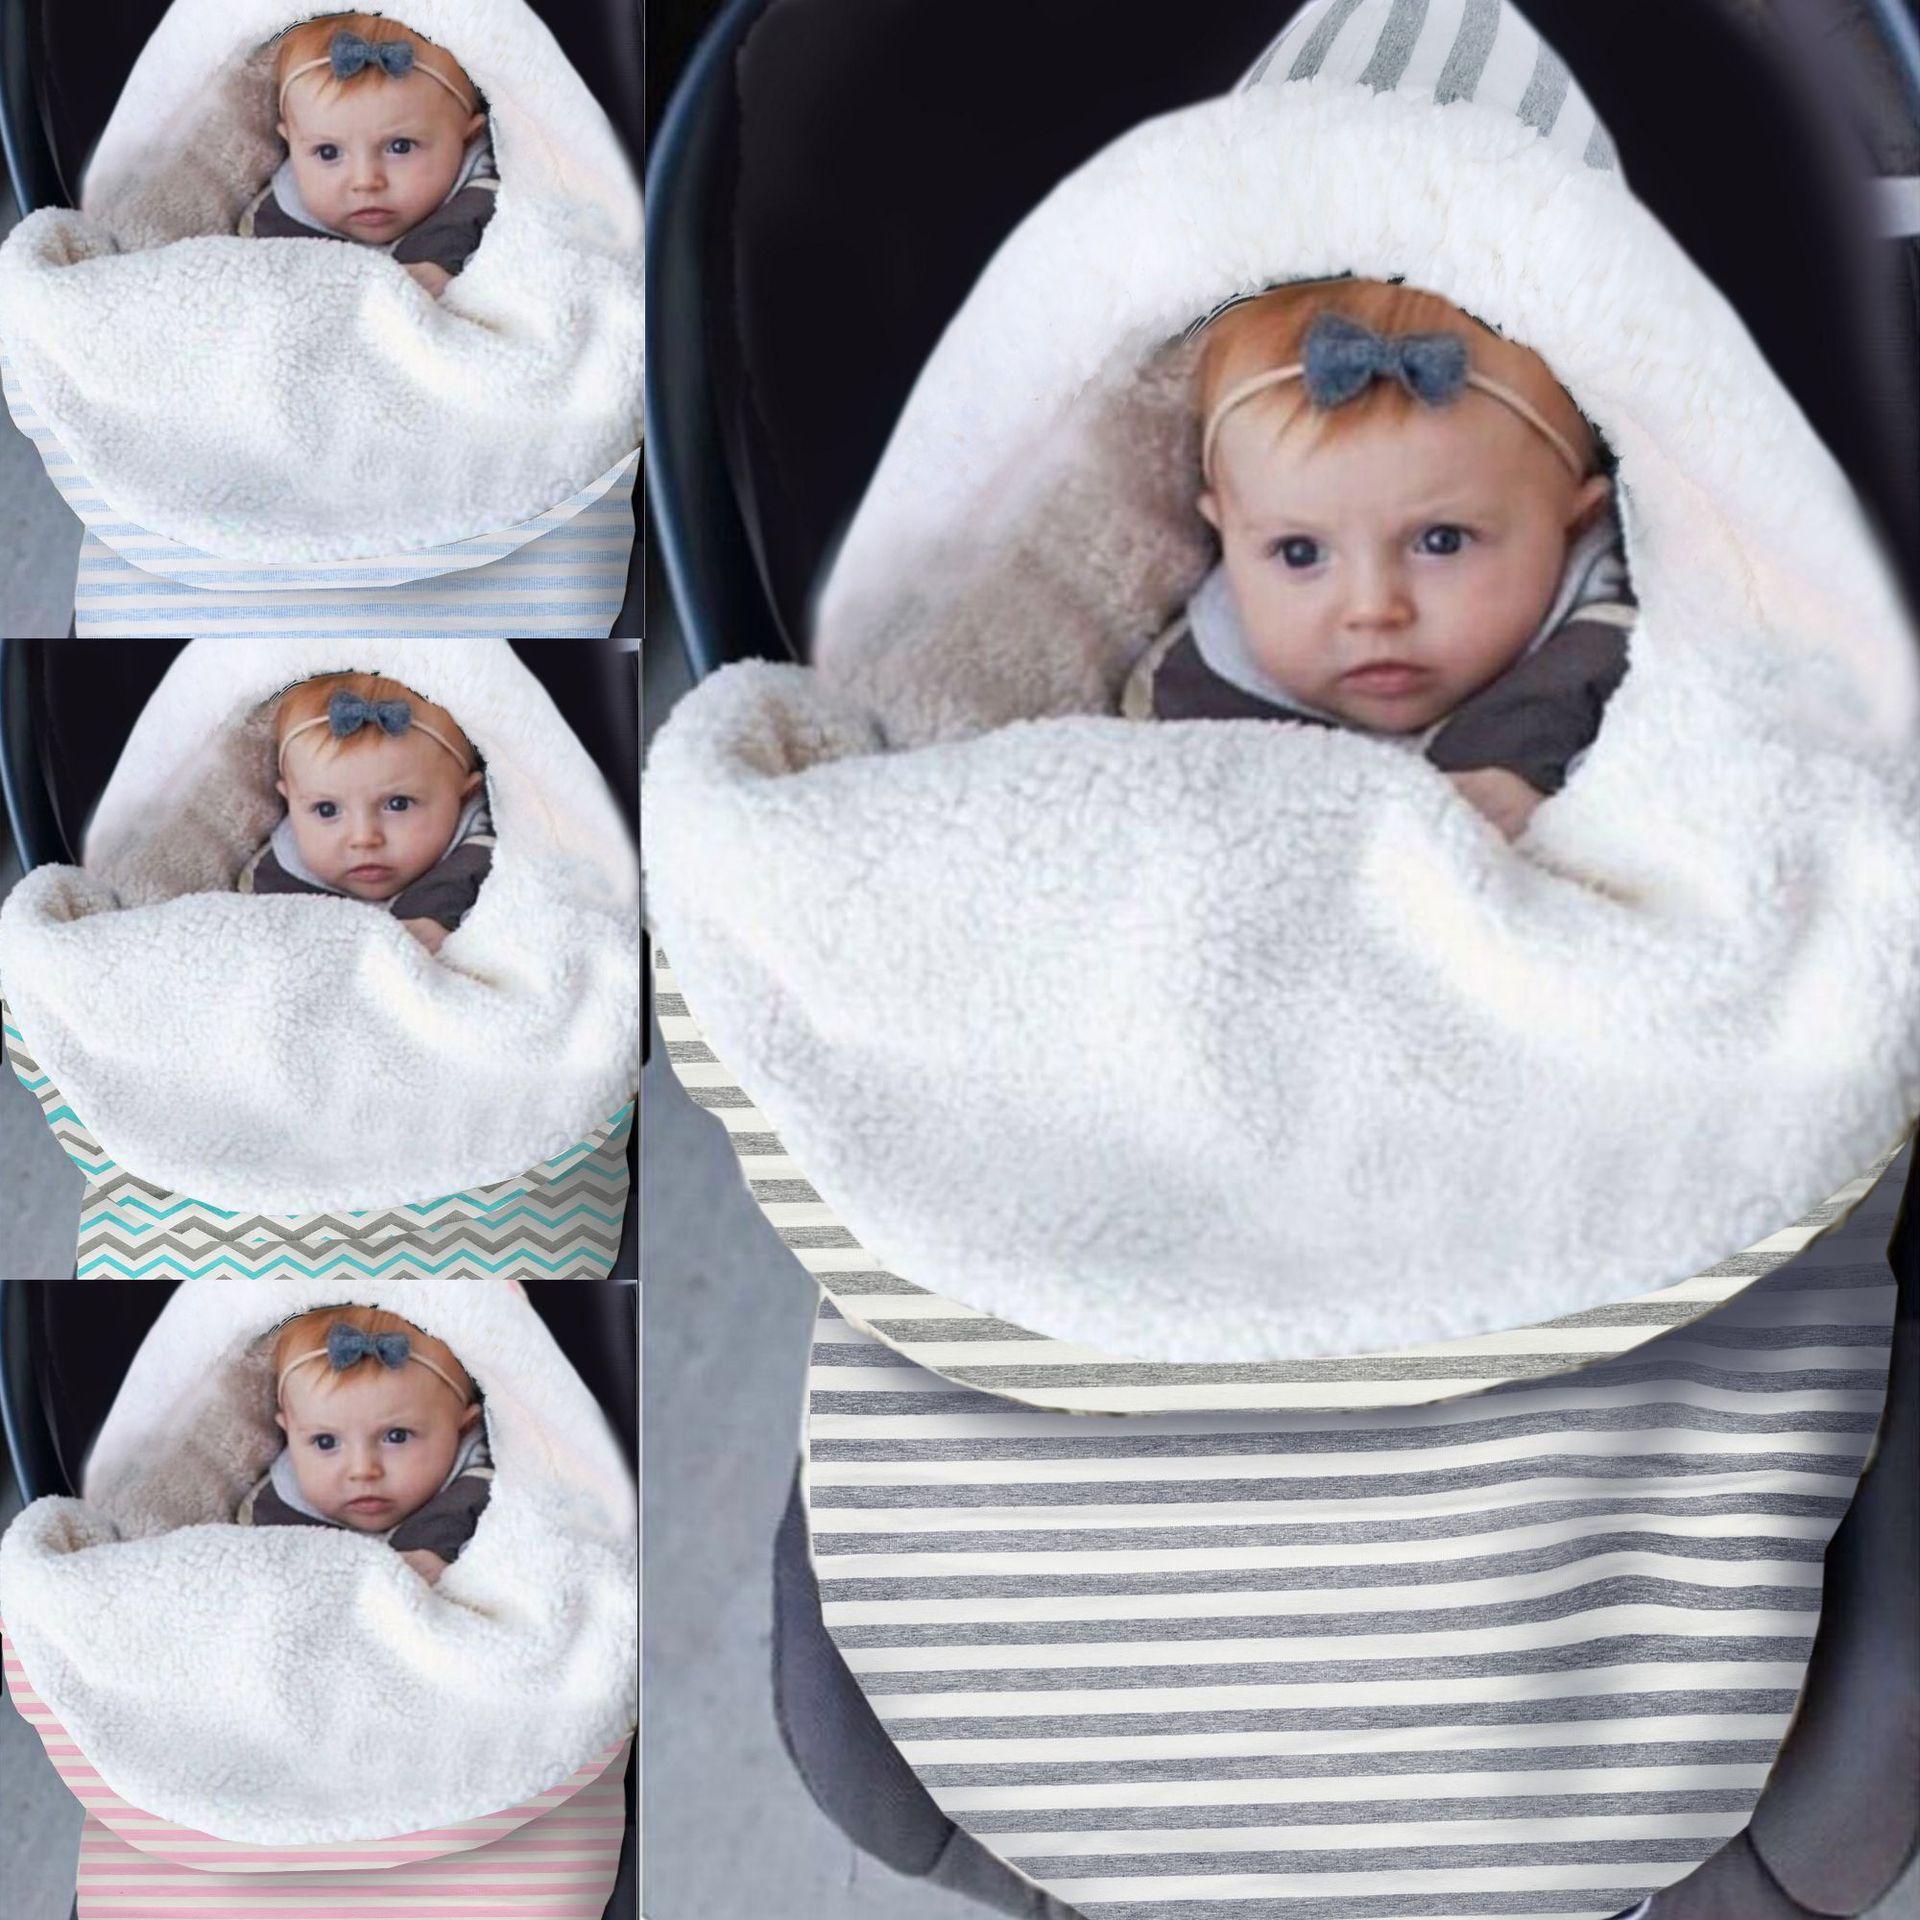 Winter Baby Sleeping Bag Envelope Warm Thicken Knitted Sleepsack For Stroller Newborn Infant Swaddle Wrap Blanket